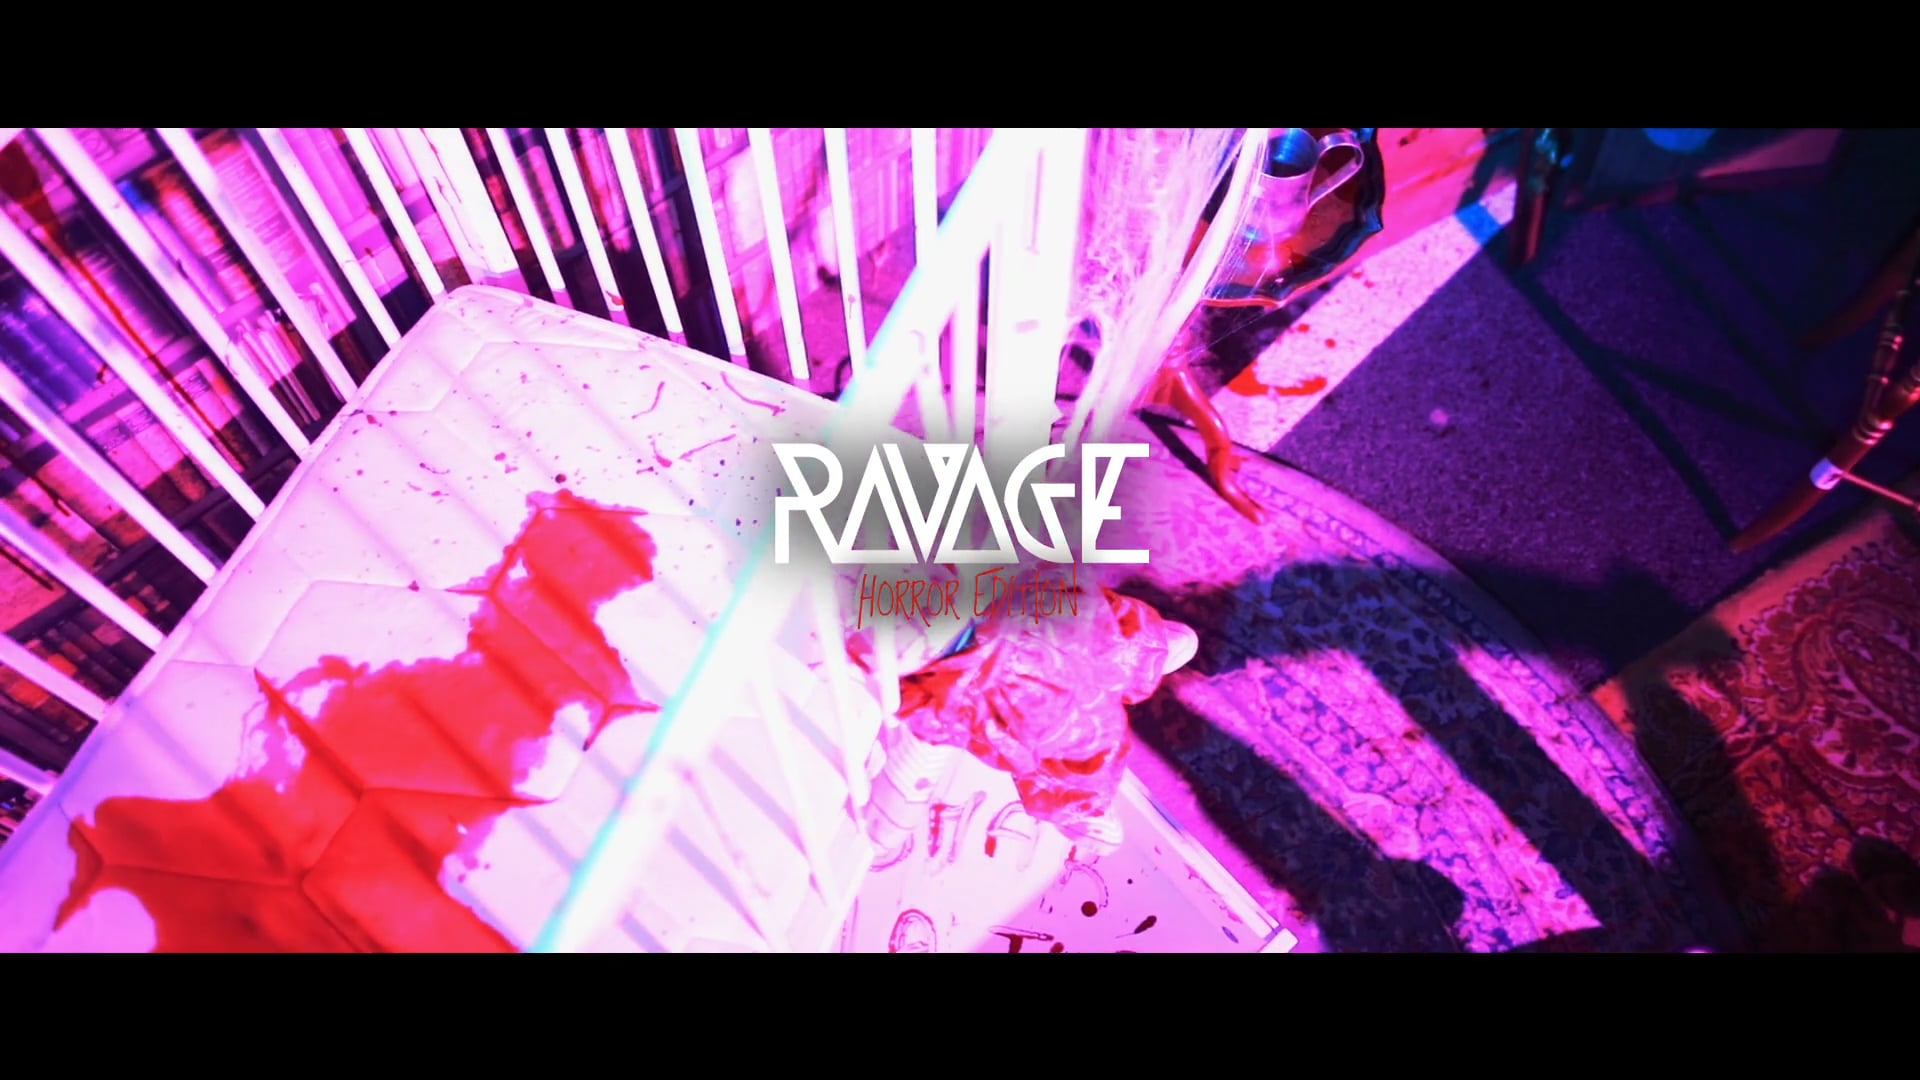 Bowl - Ravage Horror